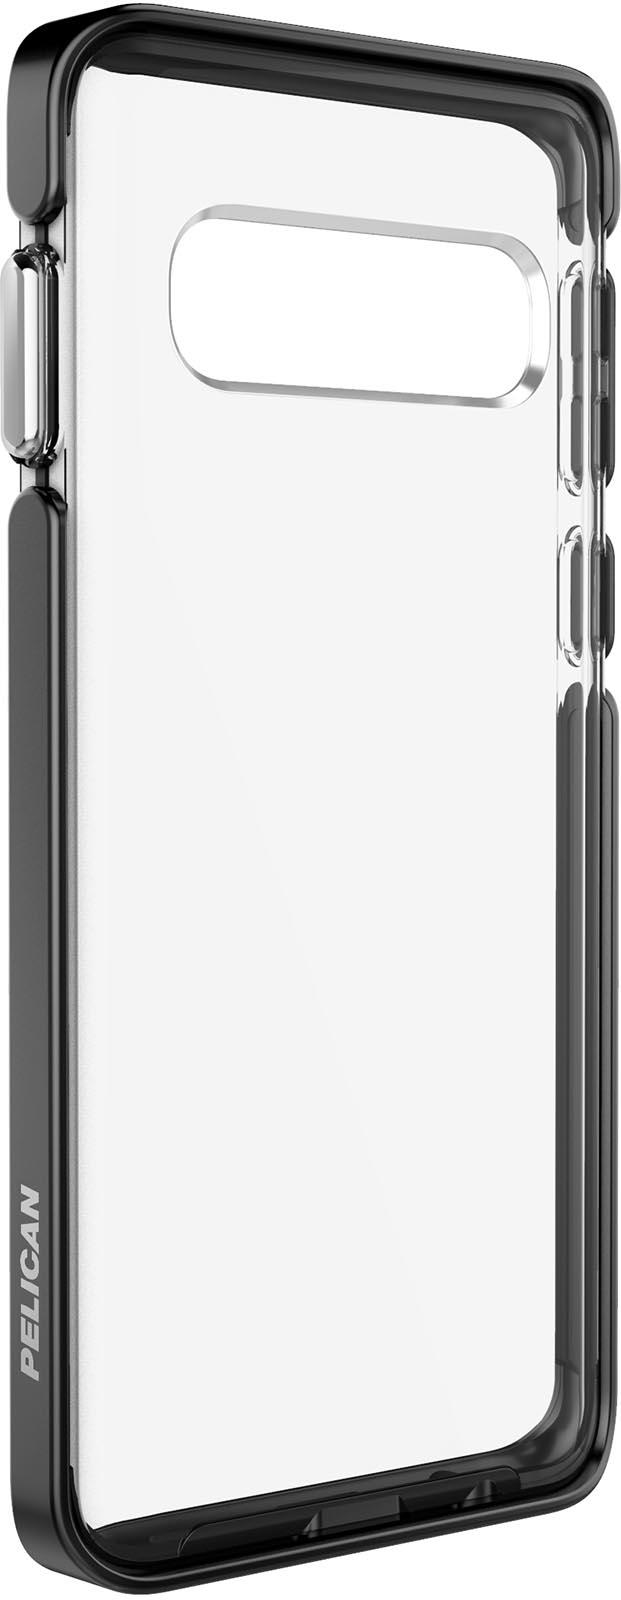 pelican samsung galaxy s10 ambassador phone case